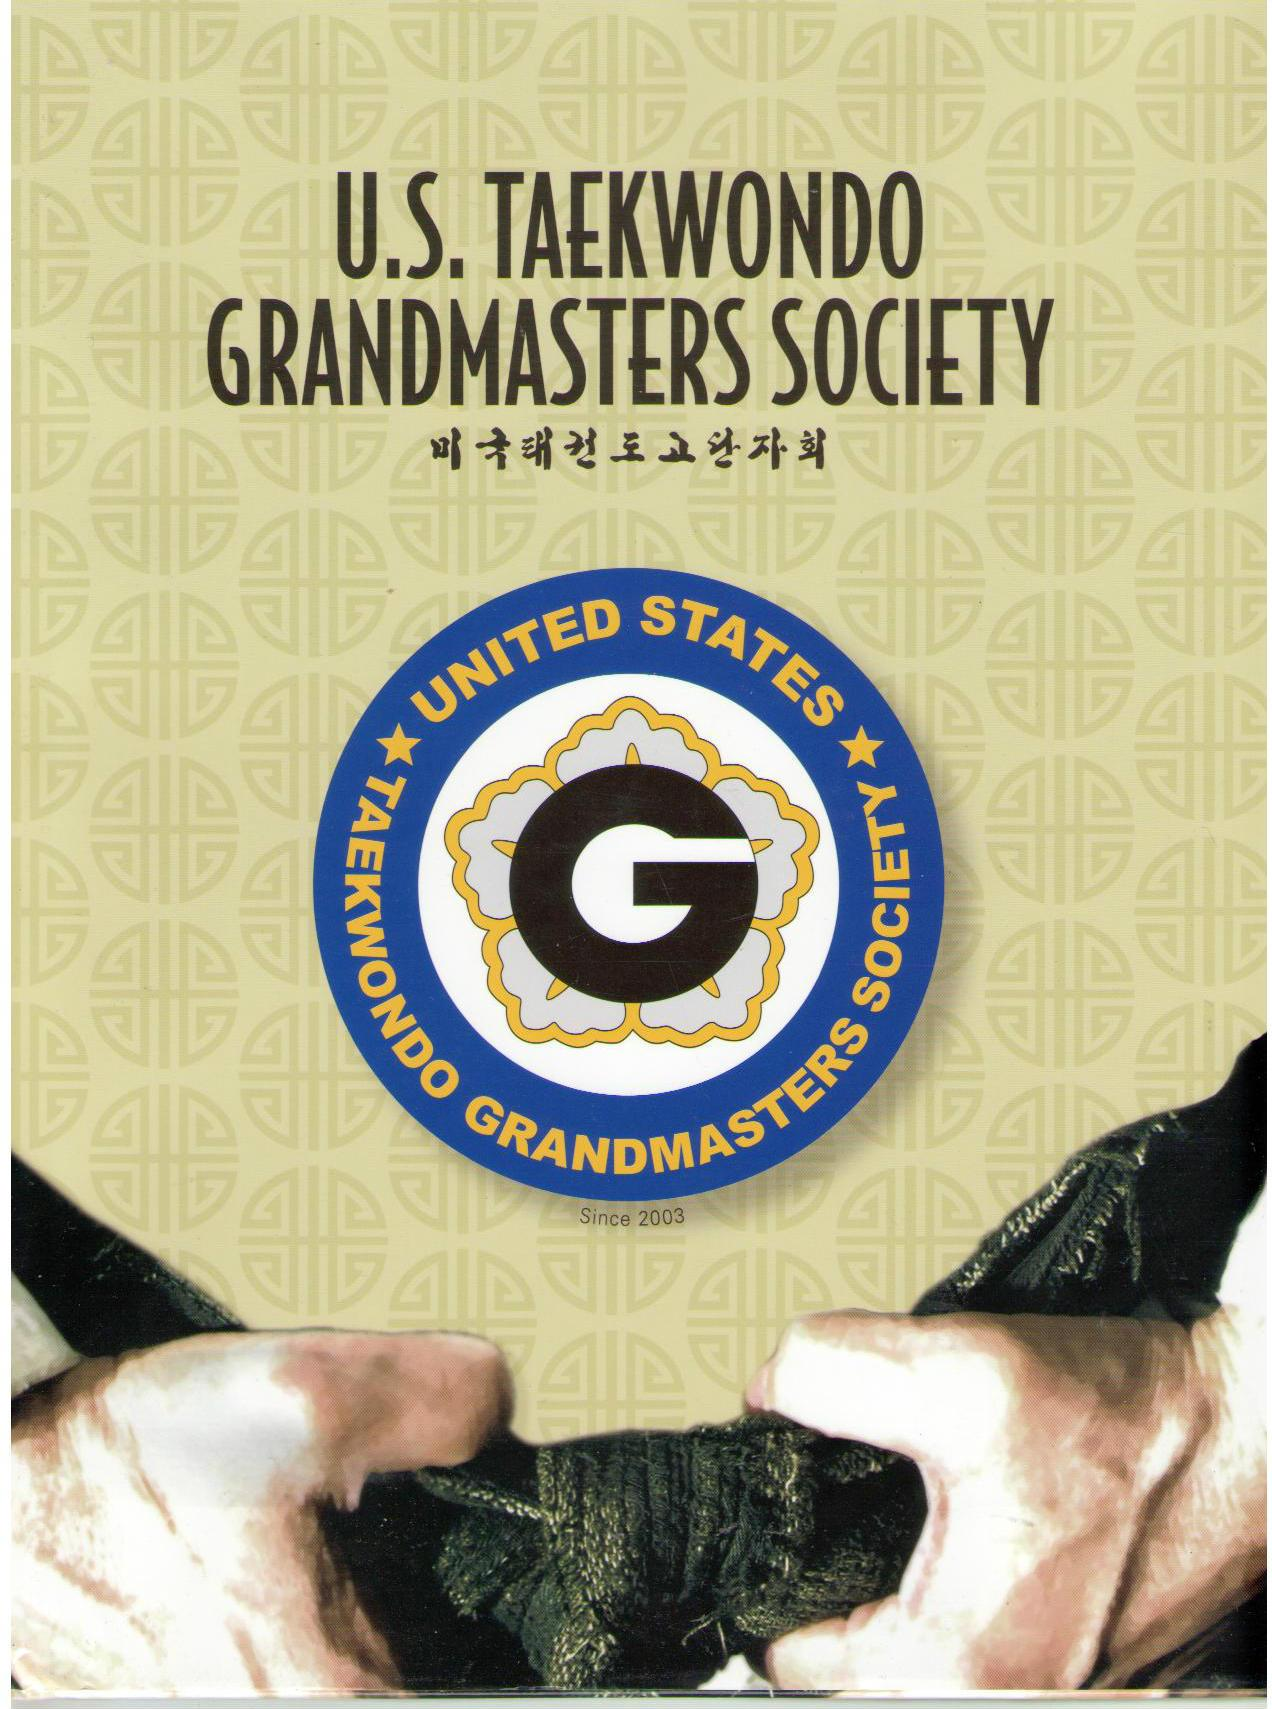 U.S. Taekwondo Grandmasters Society, United States Taekwondo Grandmasters Society, Inc.